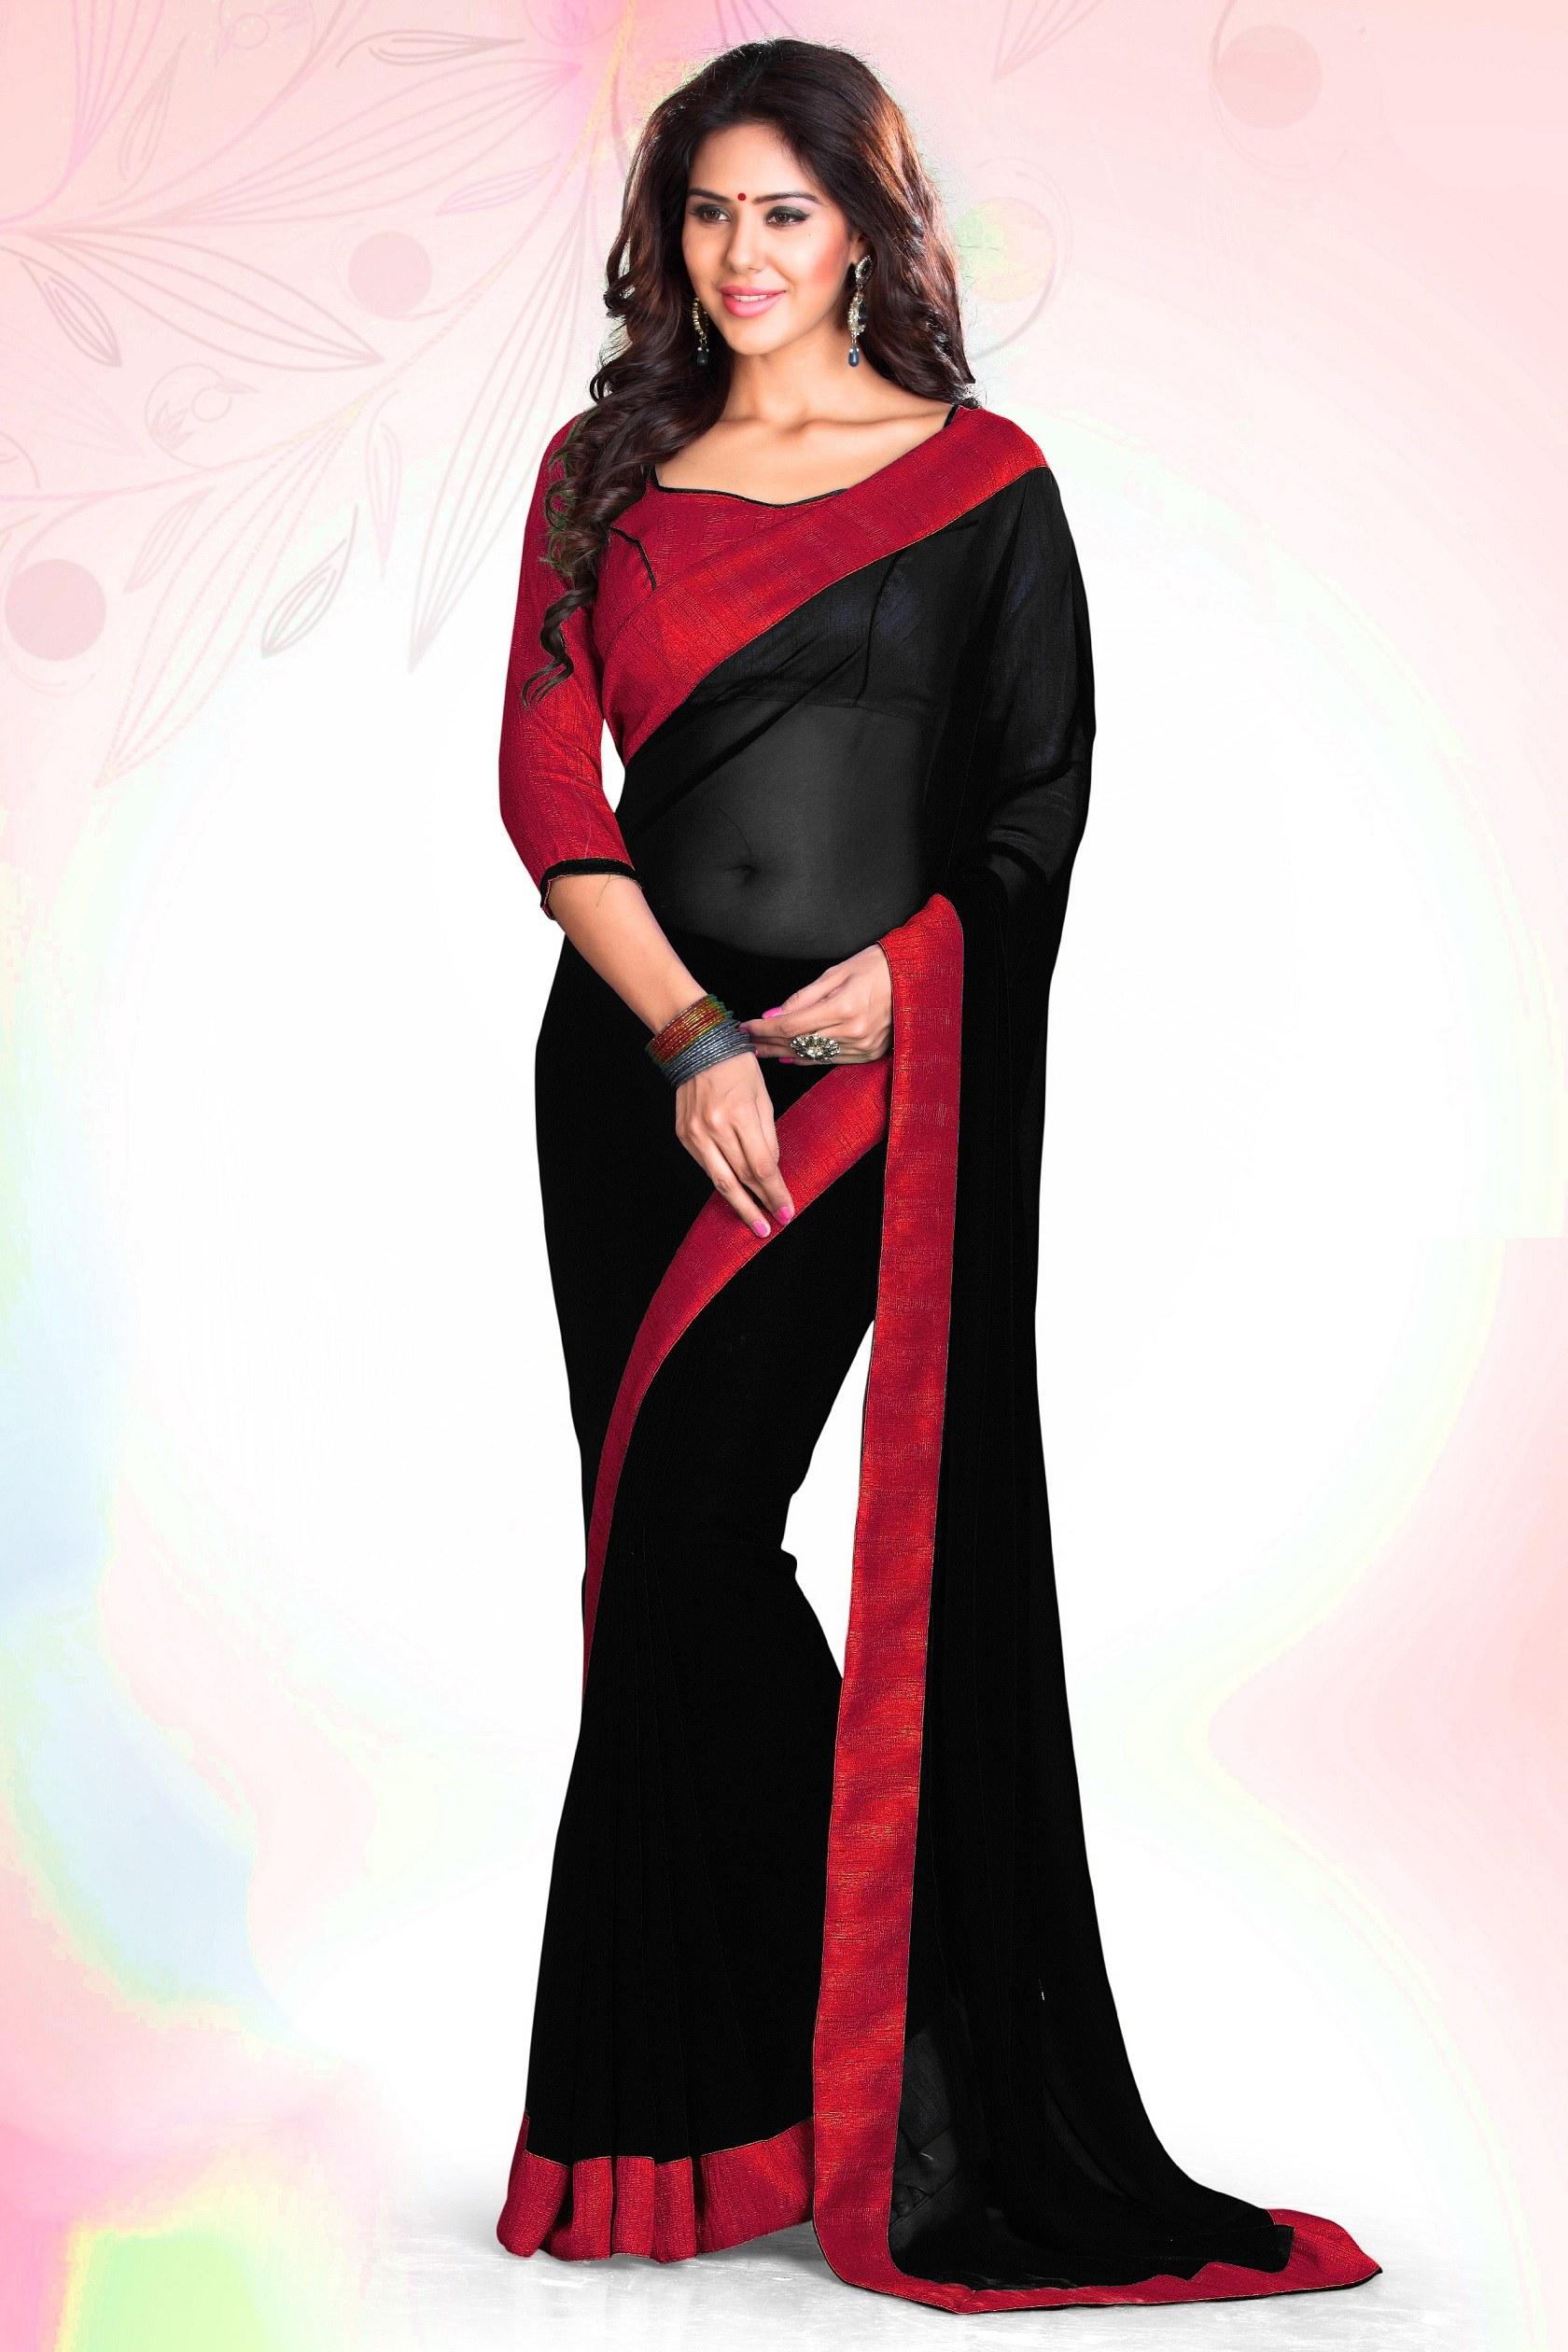 23eae49168f7e black and red plain georgette saree with blouse - Manjula Feb - 585265